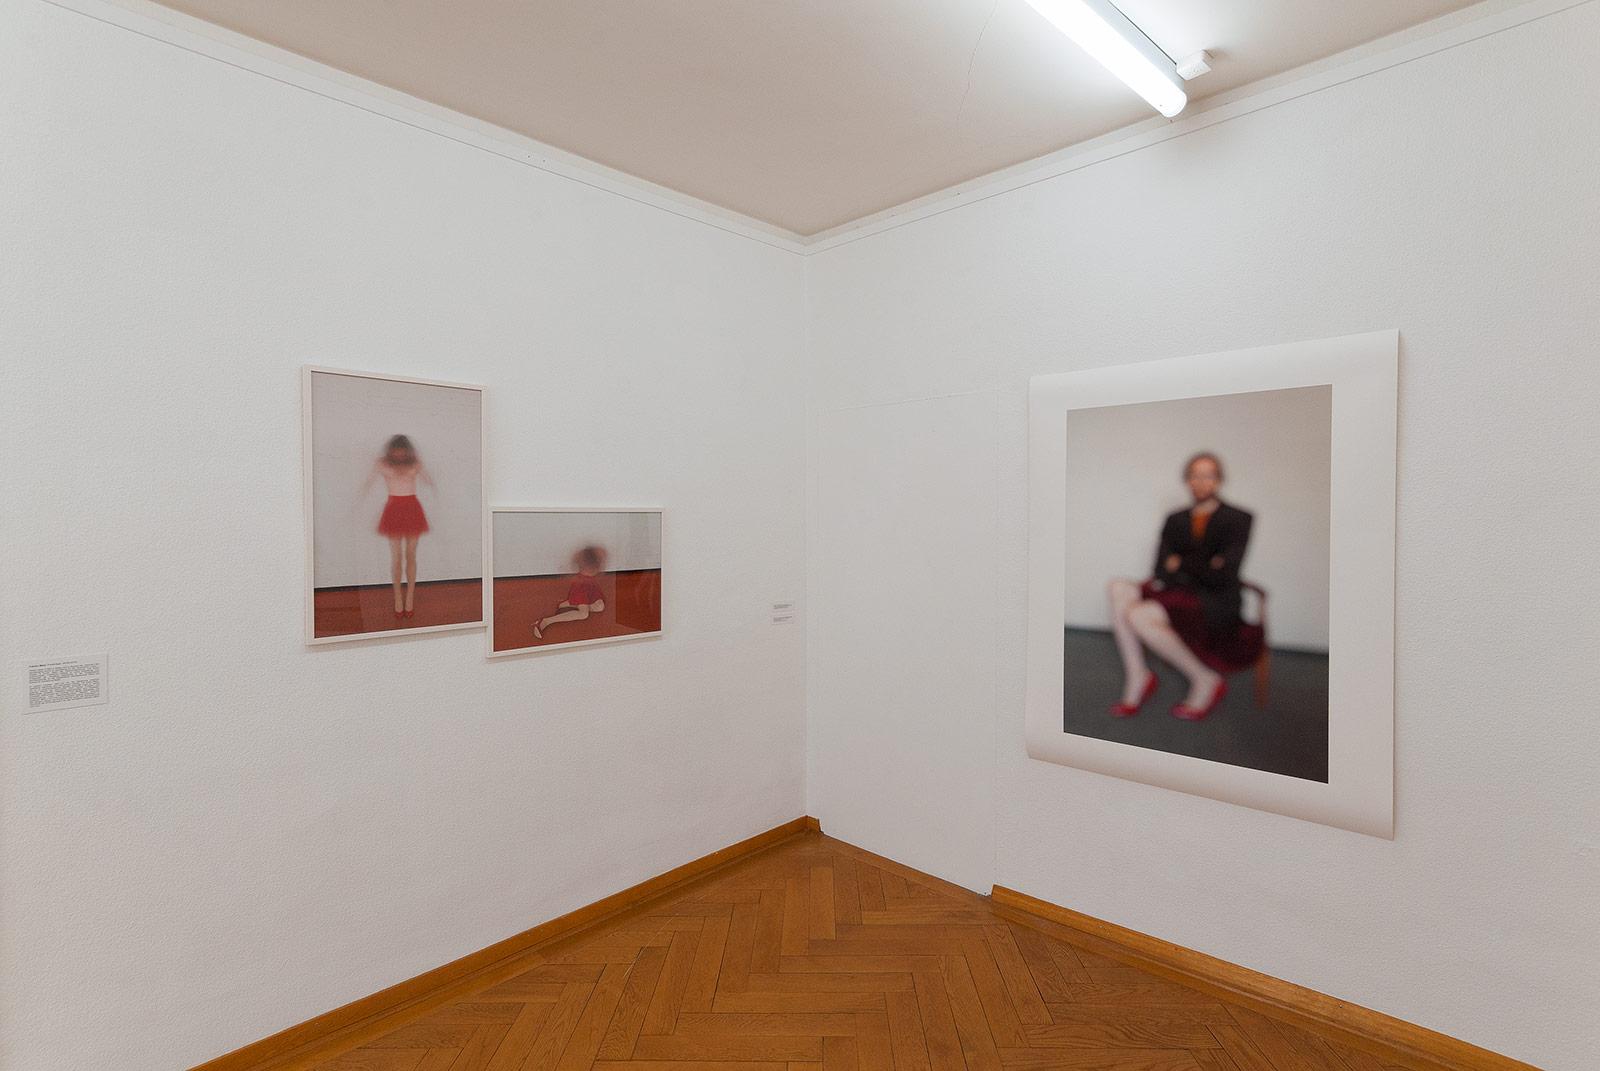 fabian_matz_2016_Projektraum_Kunstmuseum_Olten_Ausstellungsansicht_3